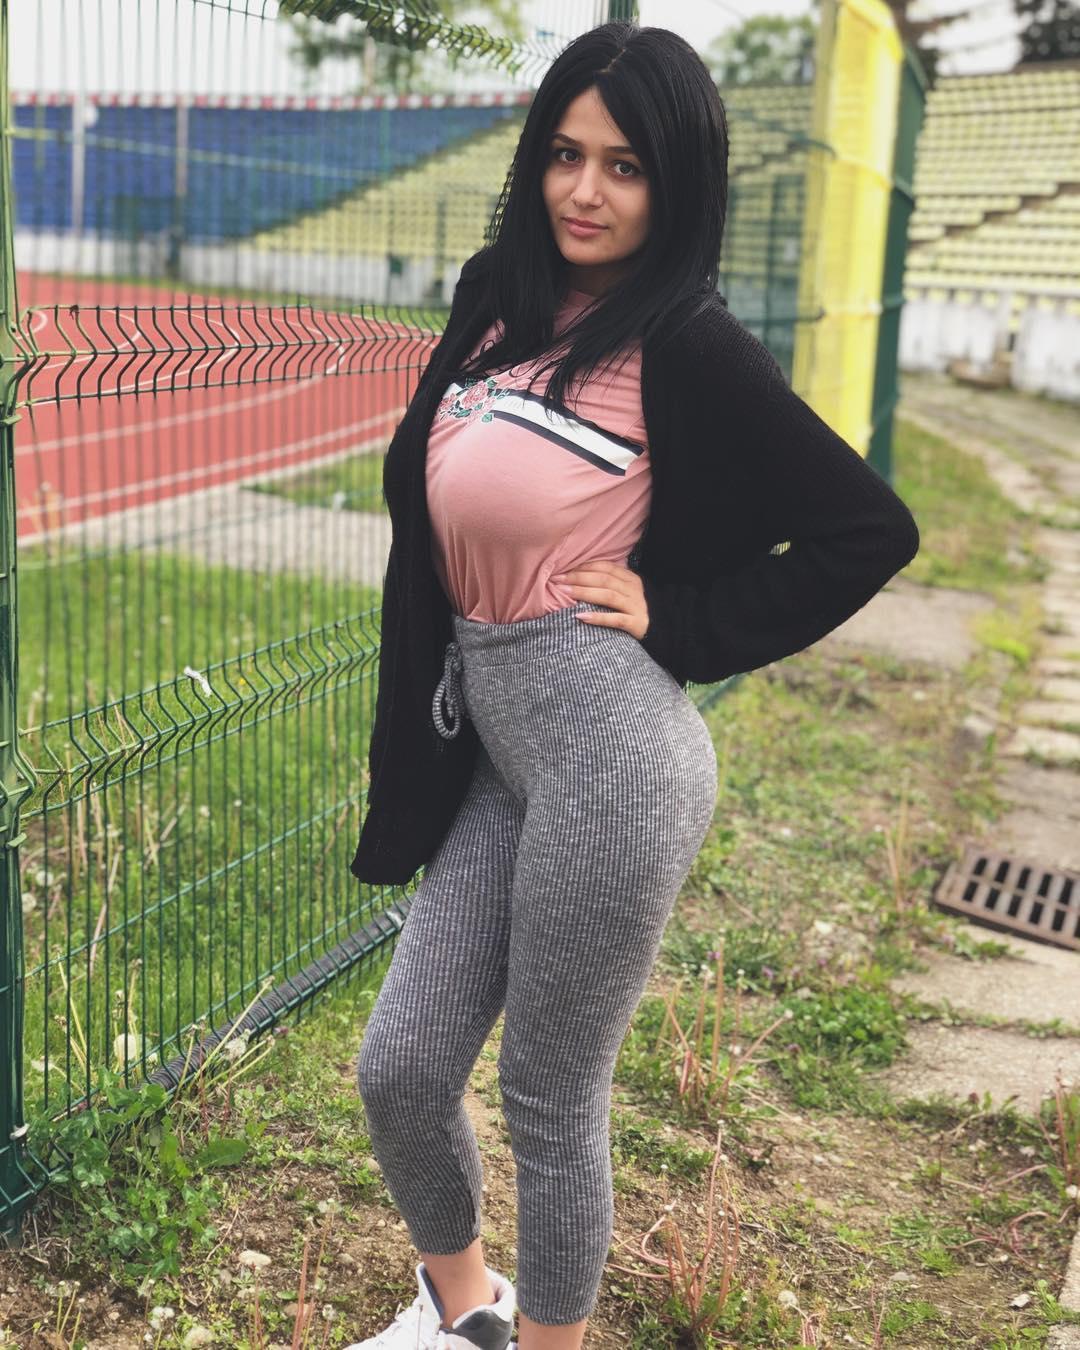 Julia-Tica-Wallpapers-Insta-Fit-Bio-4